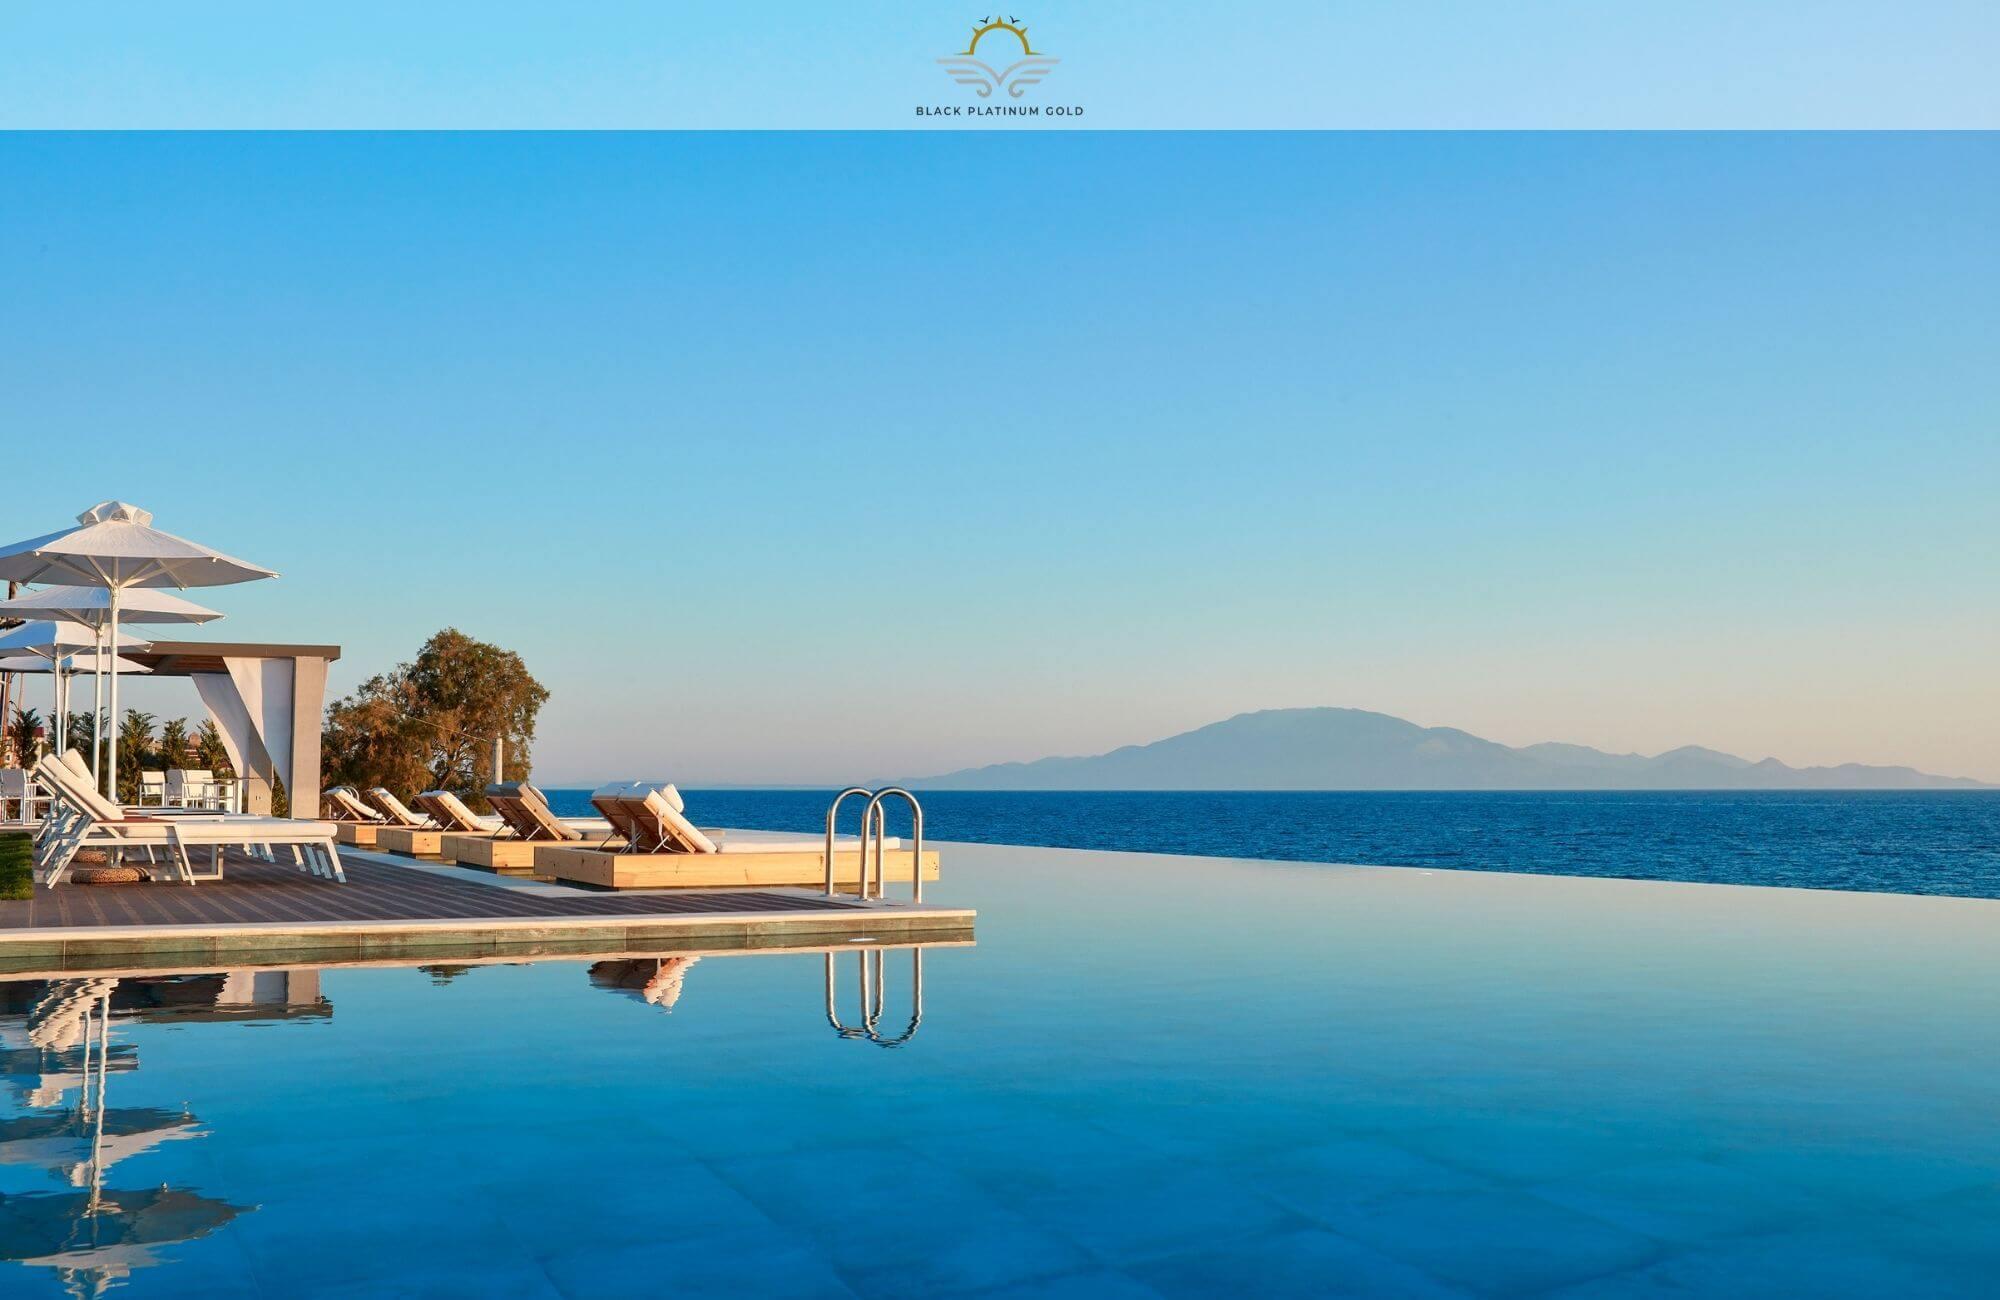 Greece – 3 Nights at Lesante Blu Exclusive Beach Resort